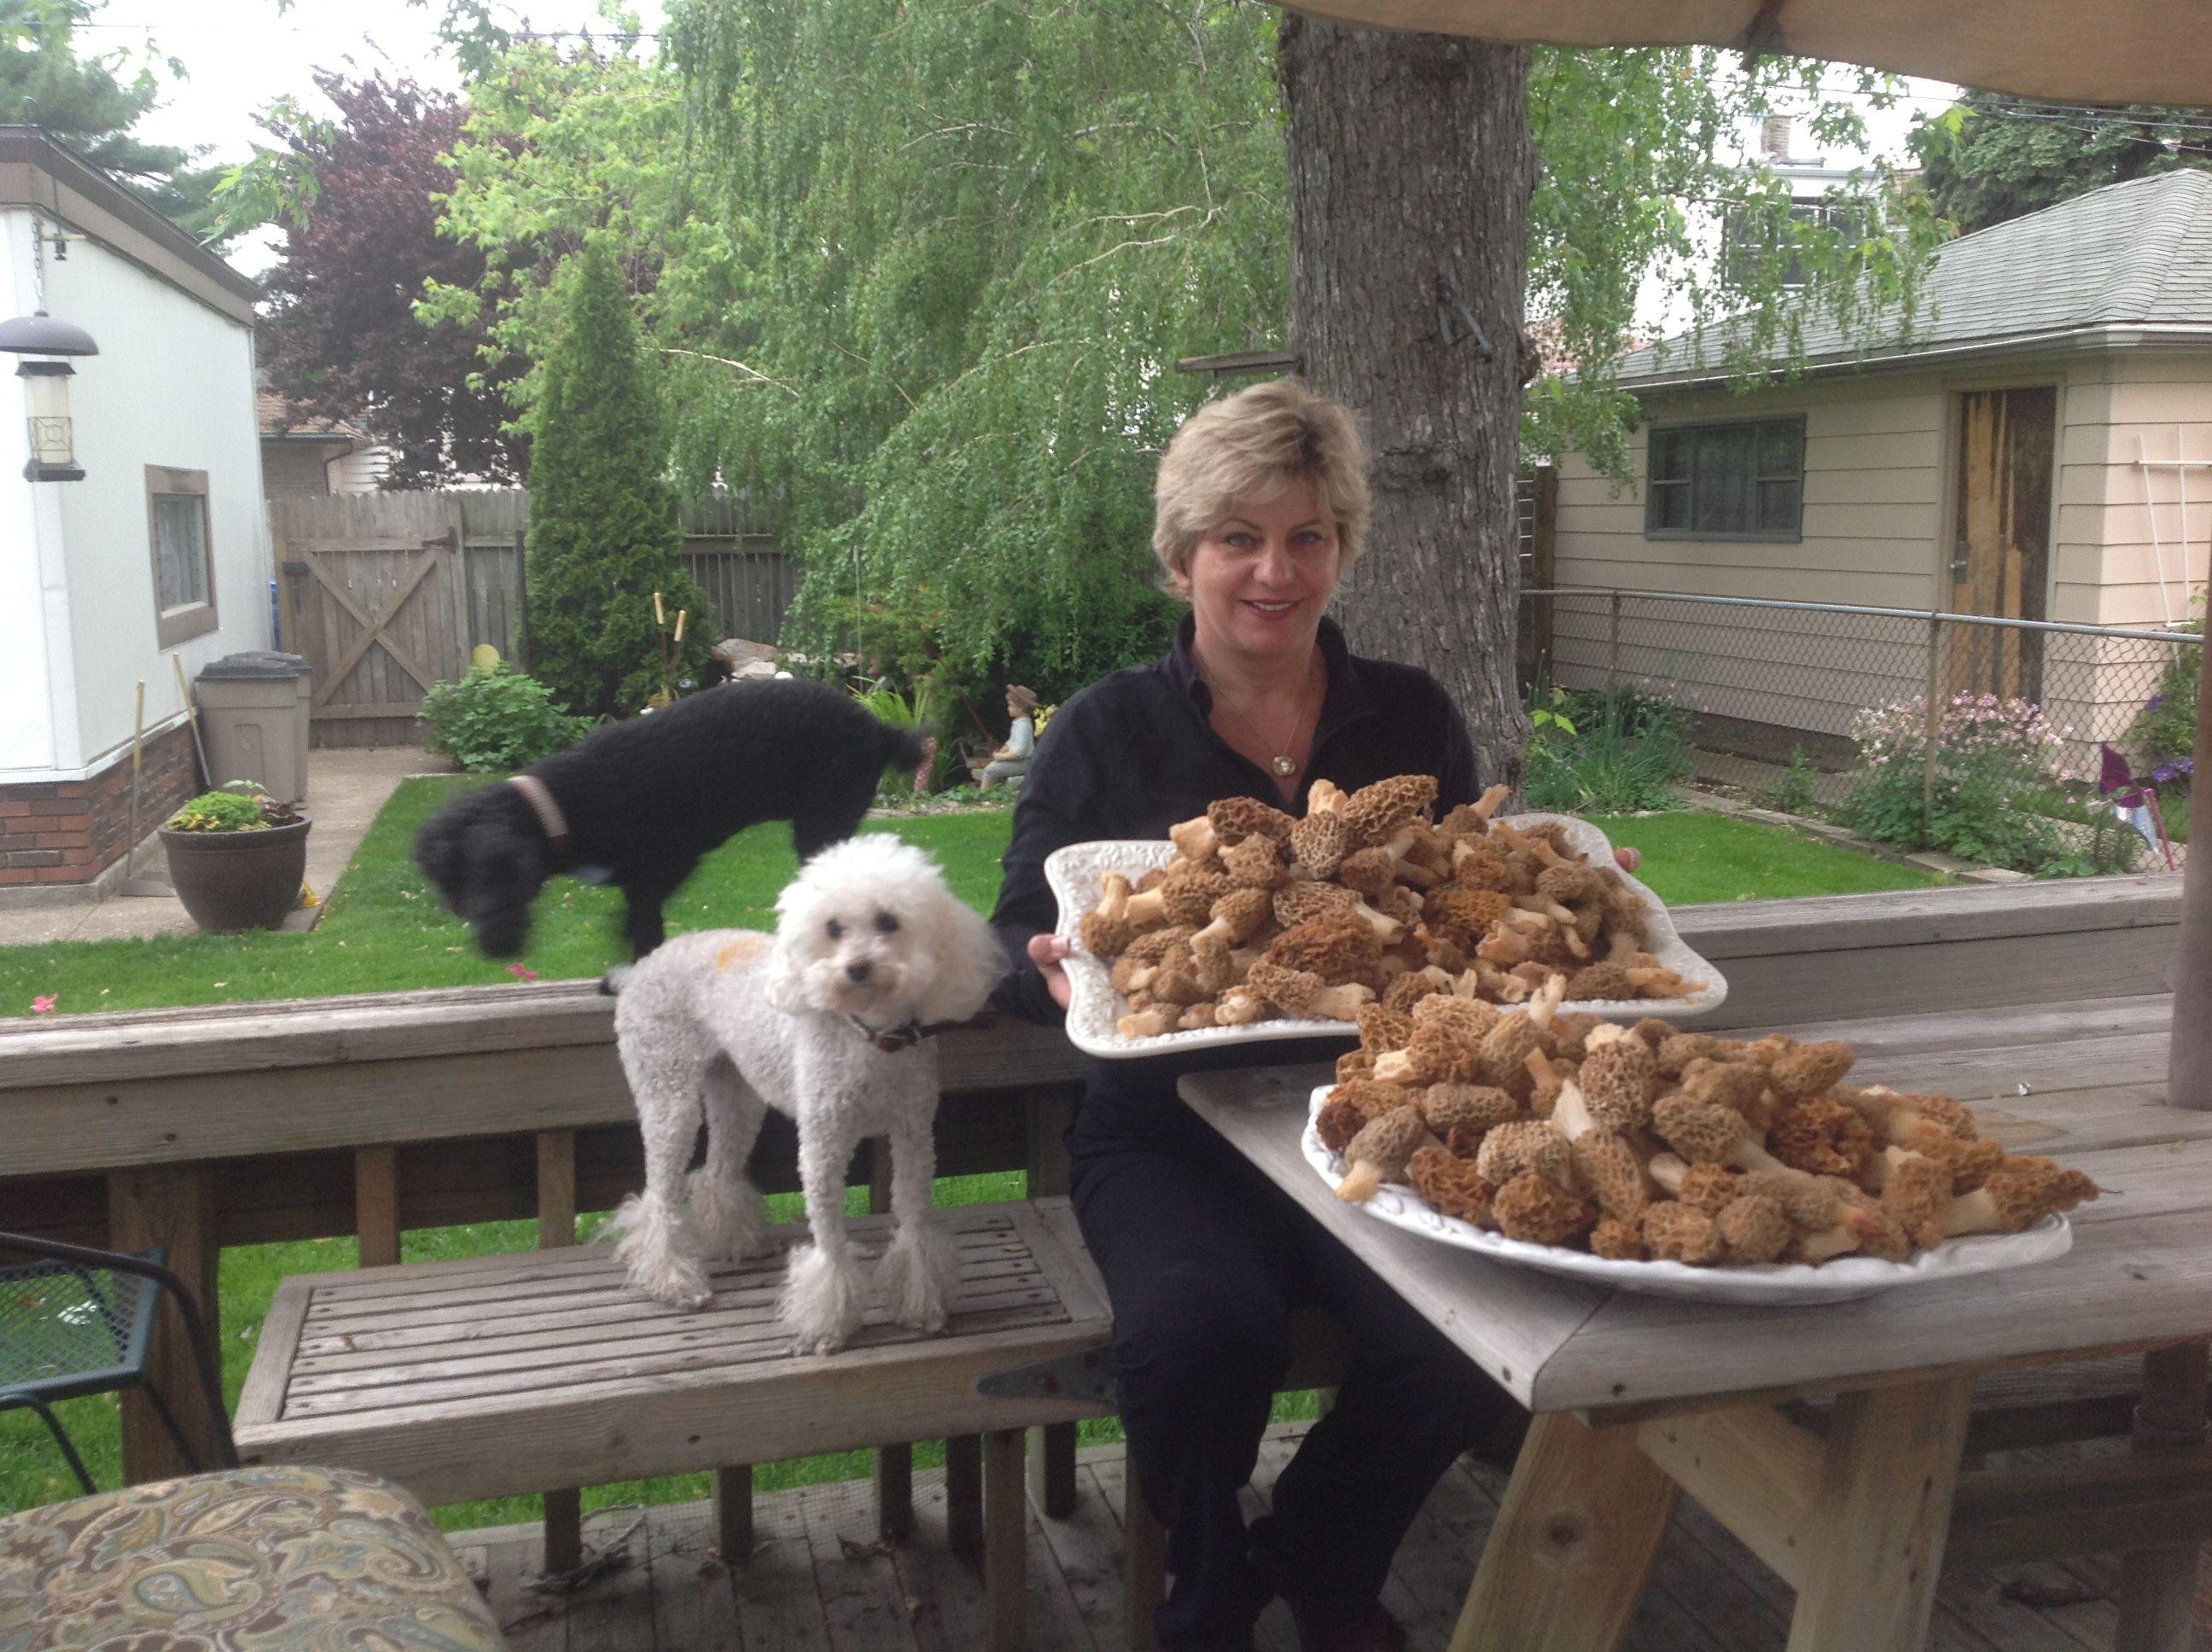 IL Mycological (Mushroom) Assoc: Chicago-based Talks, Forays